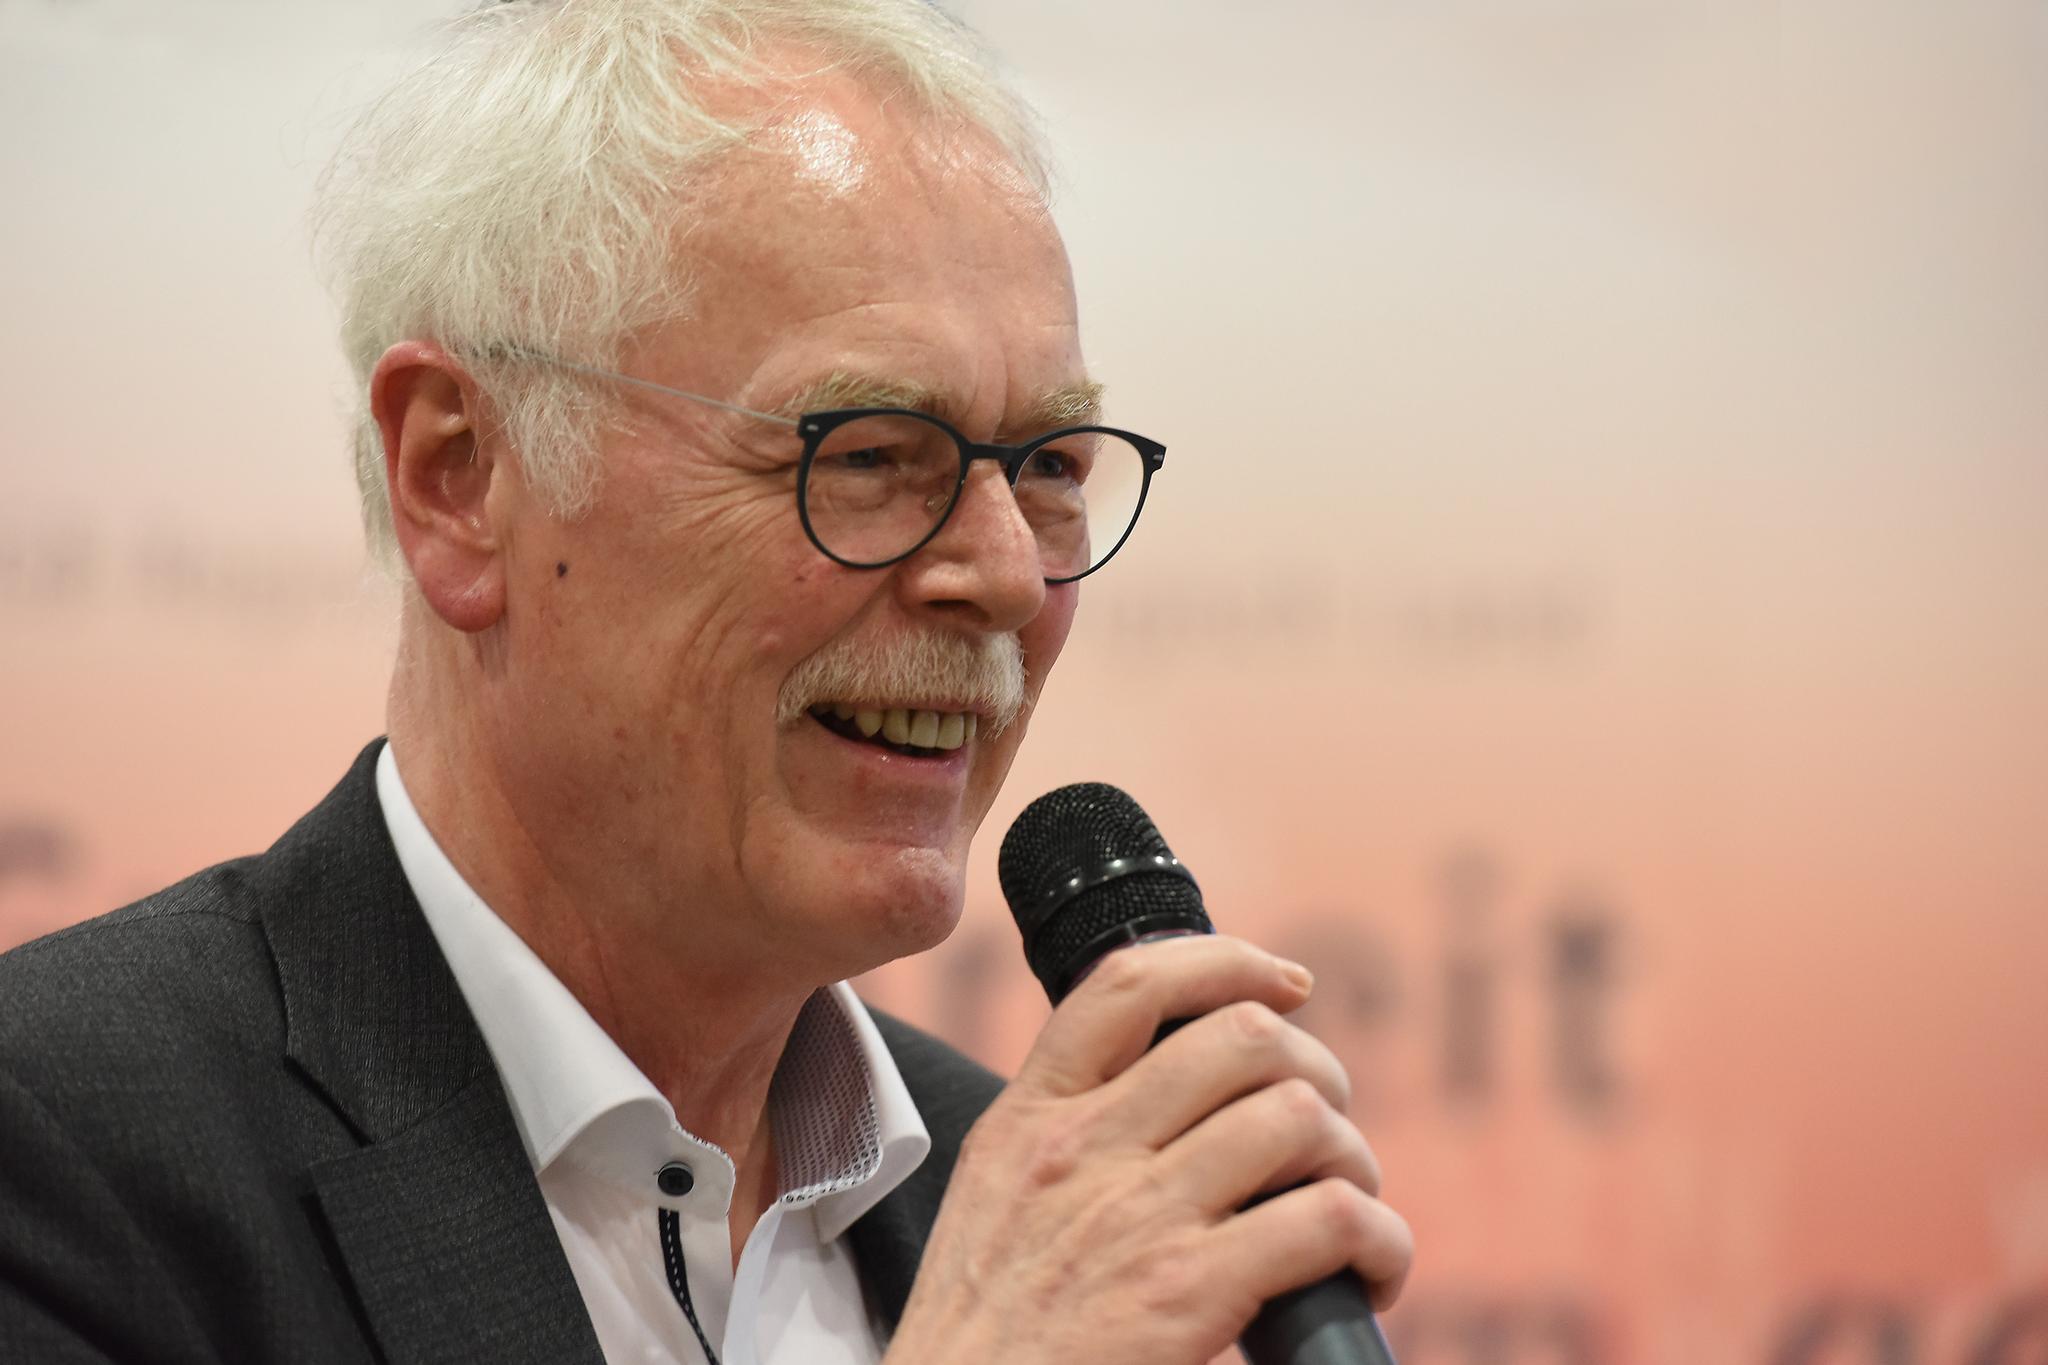 Andreas Meyer-Lauber